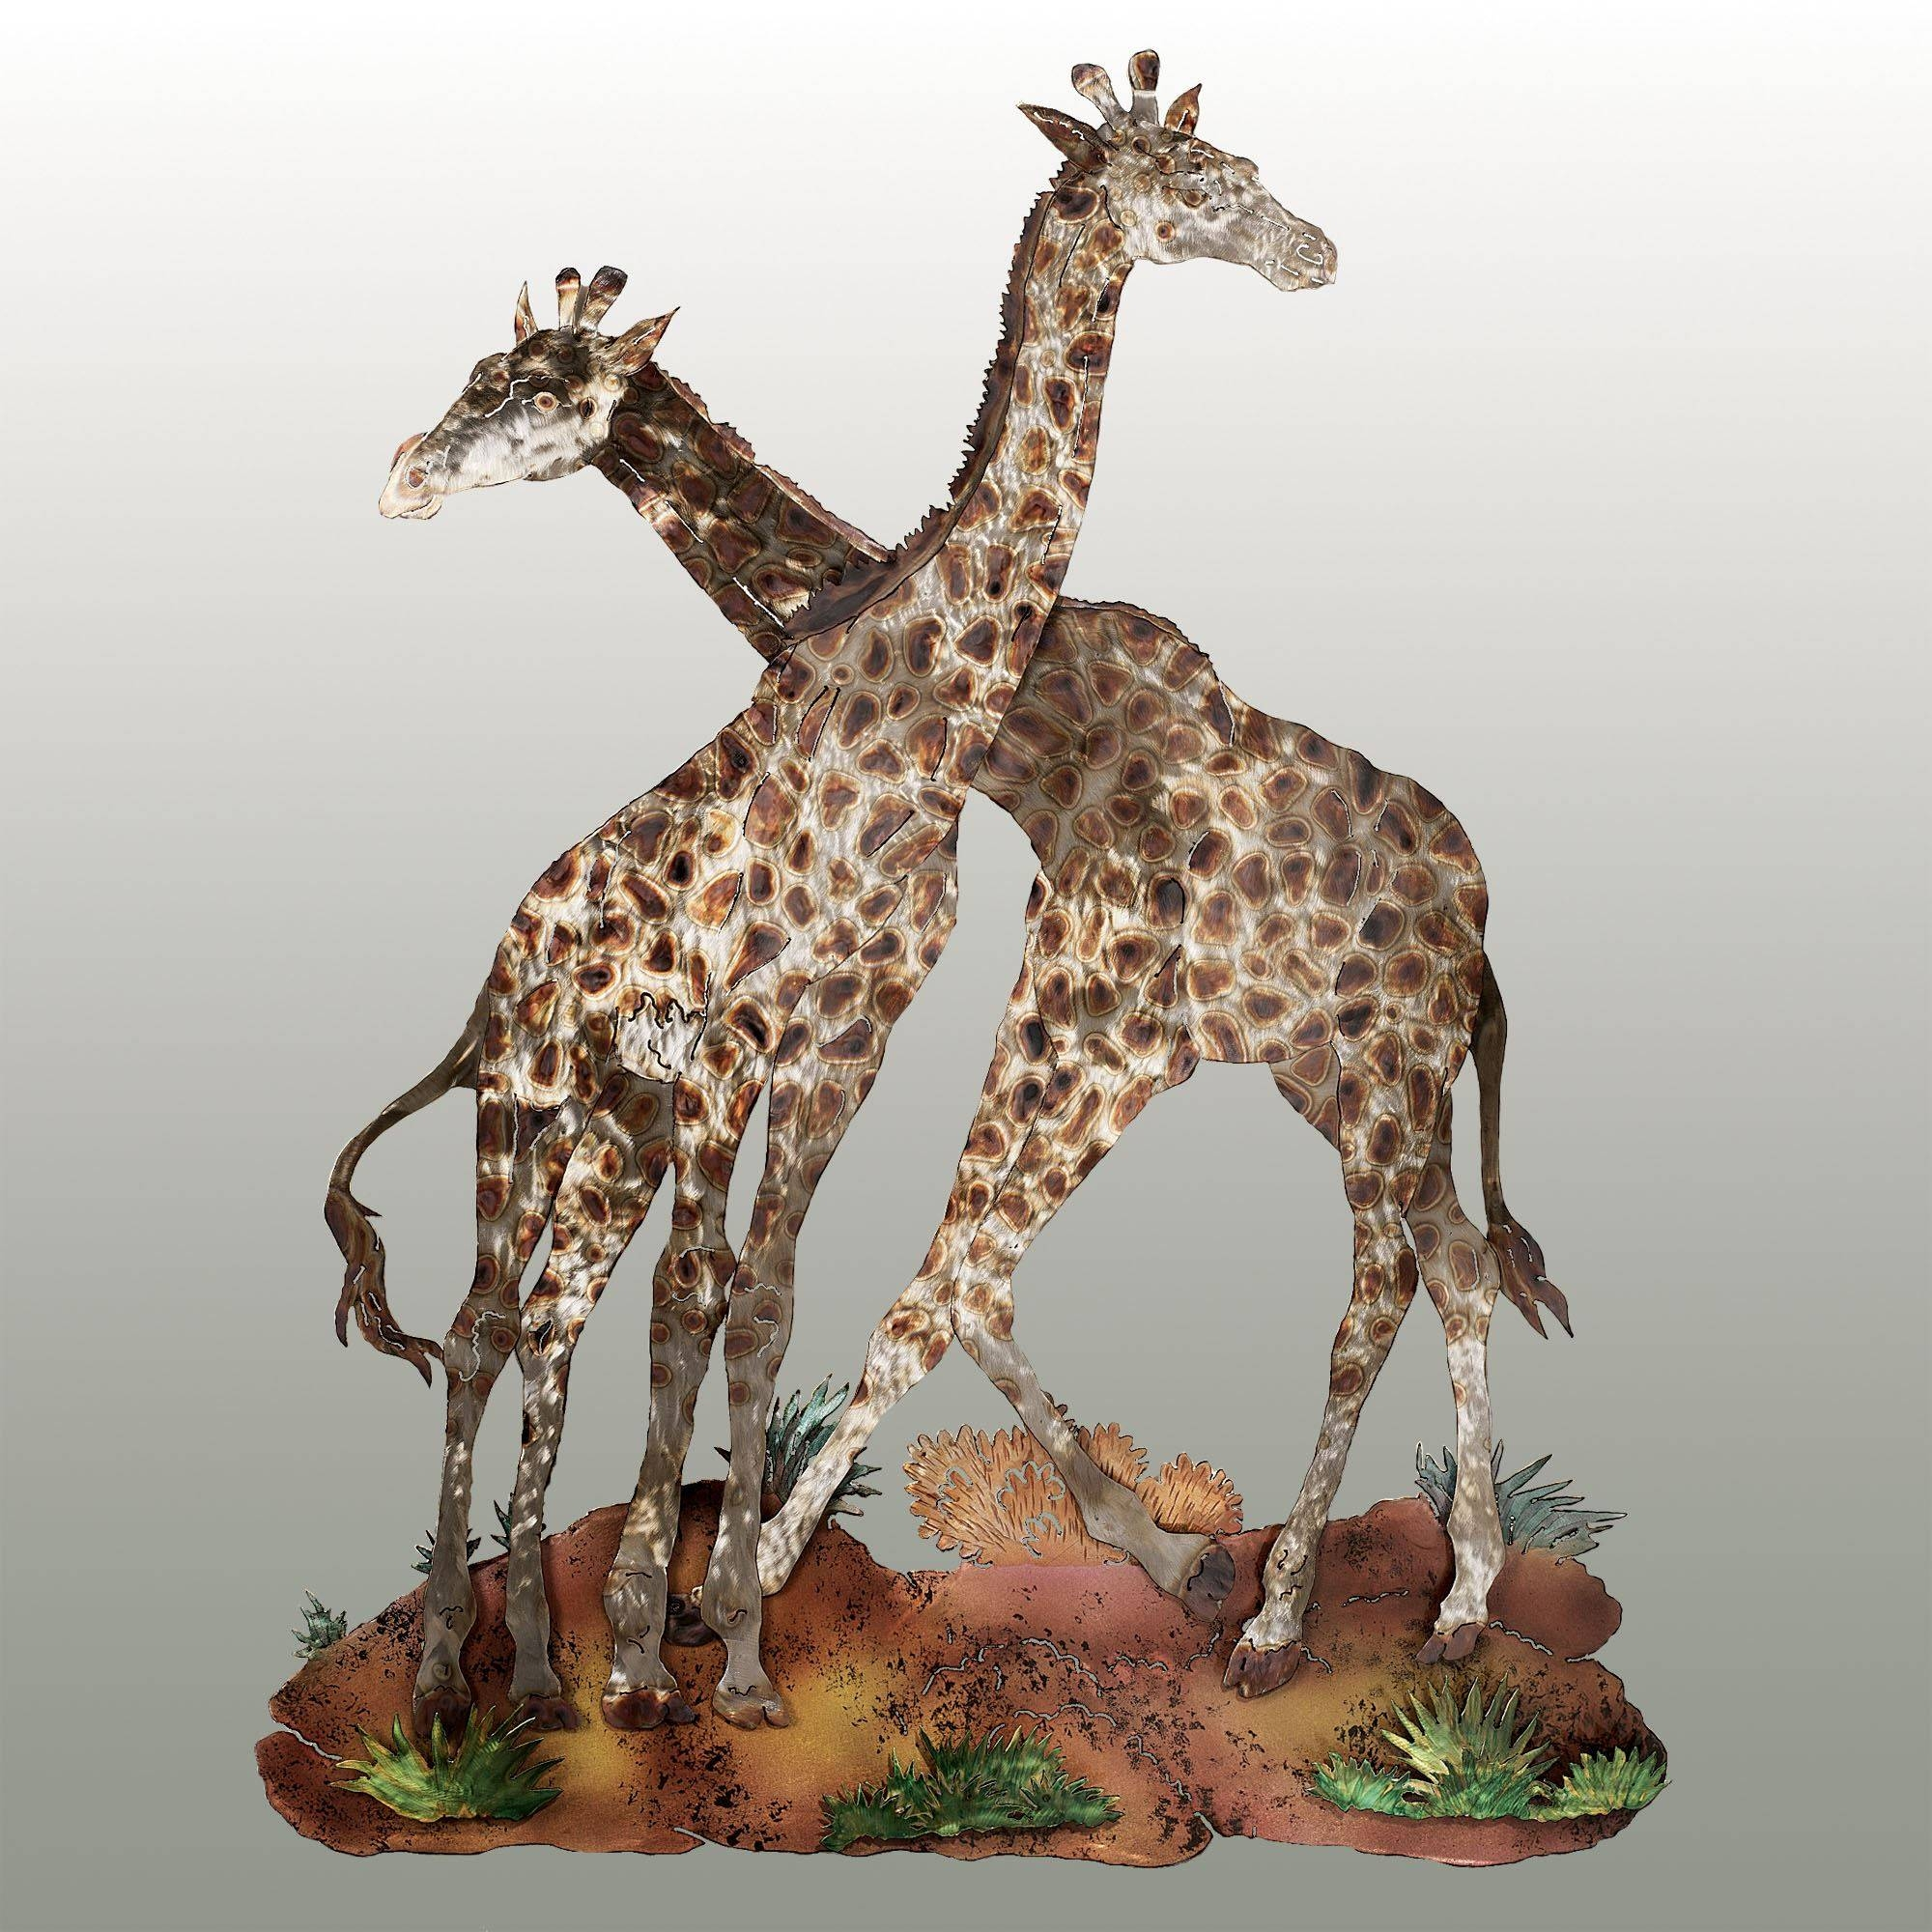 Sahara Pride Giraffe Metal Wall Sculpture With Regard To Recent Giraffe Metal Wall Art (View 17 of 20)